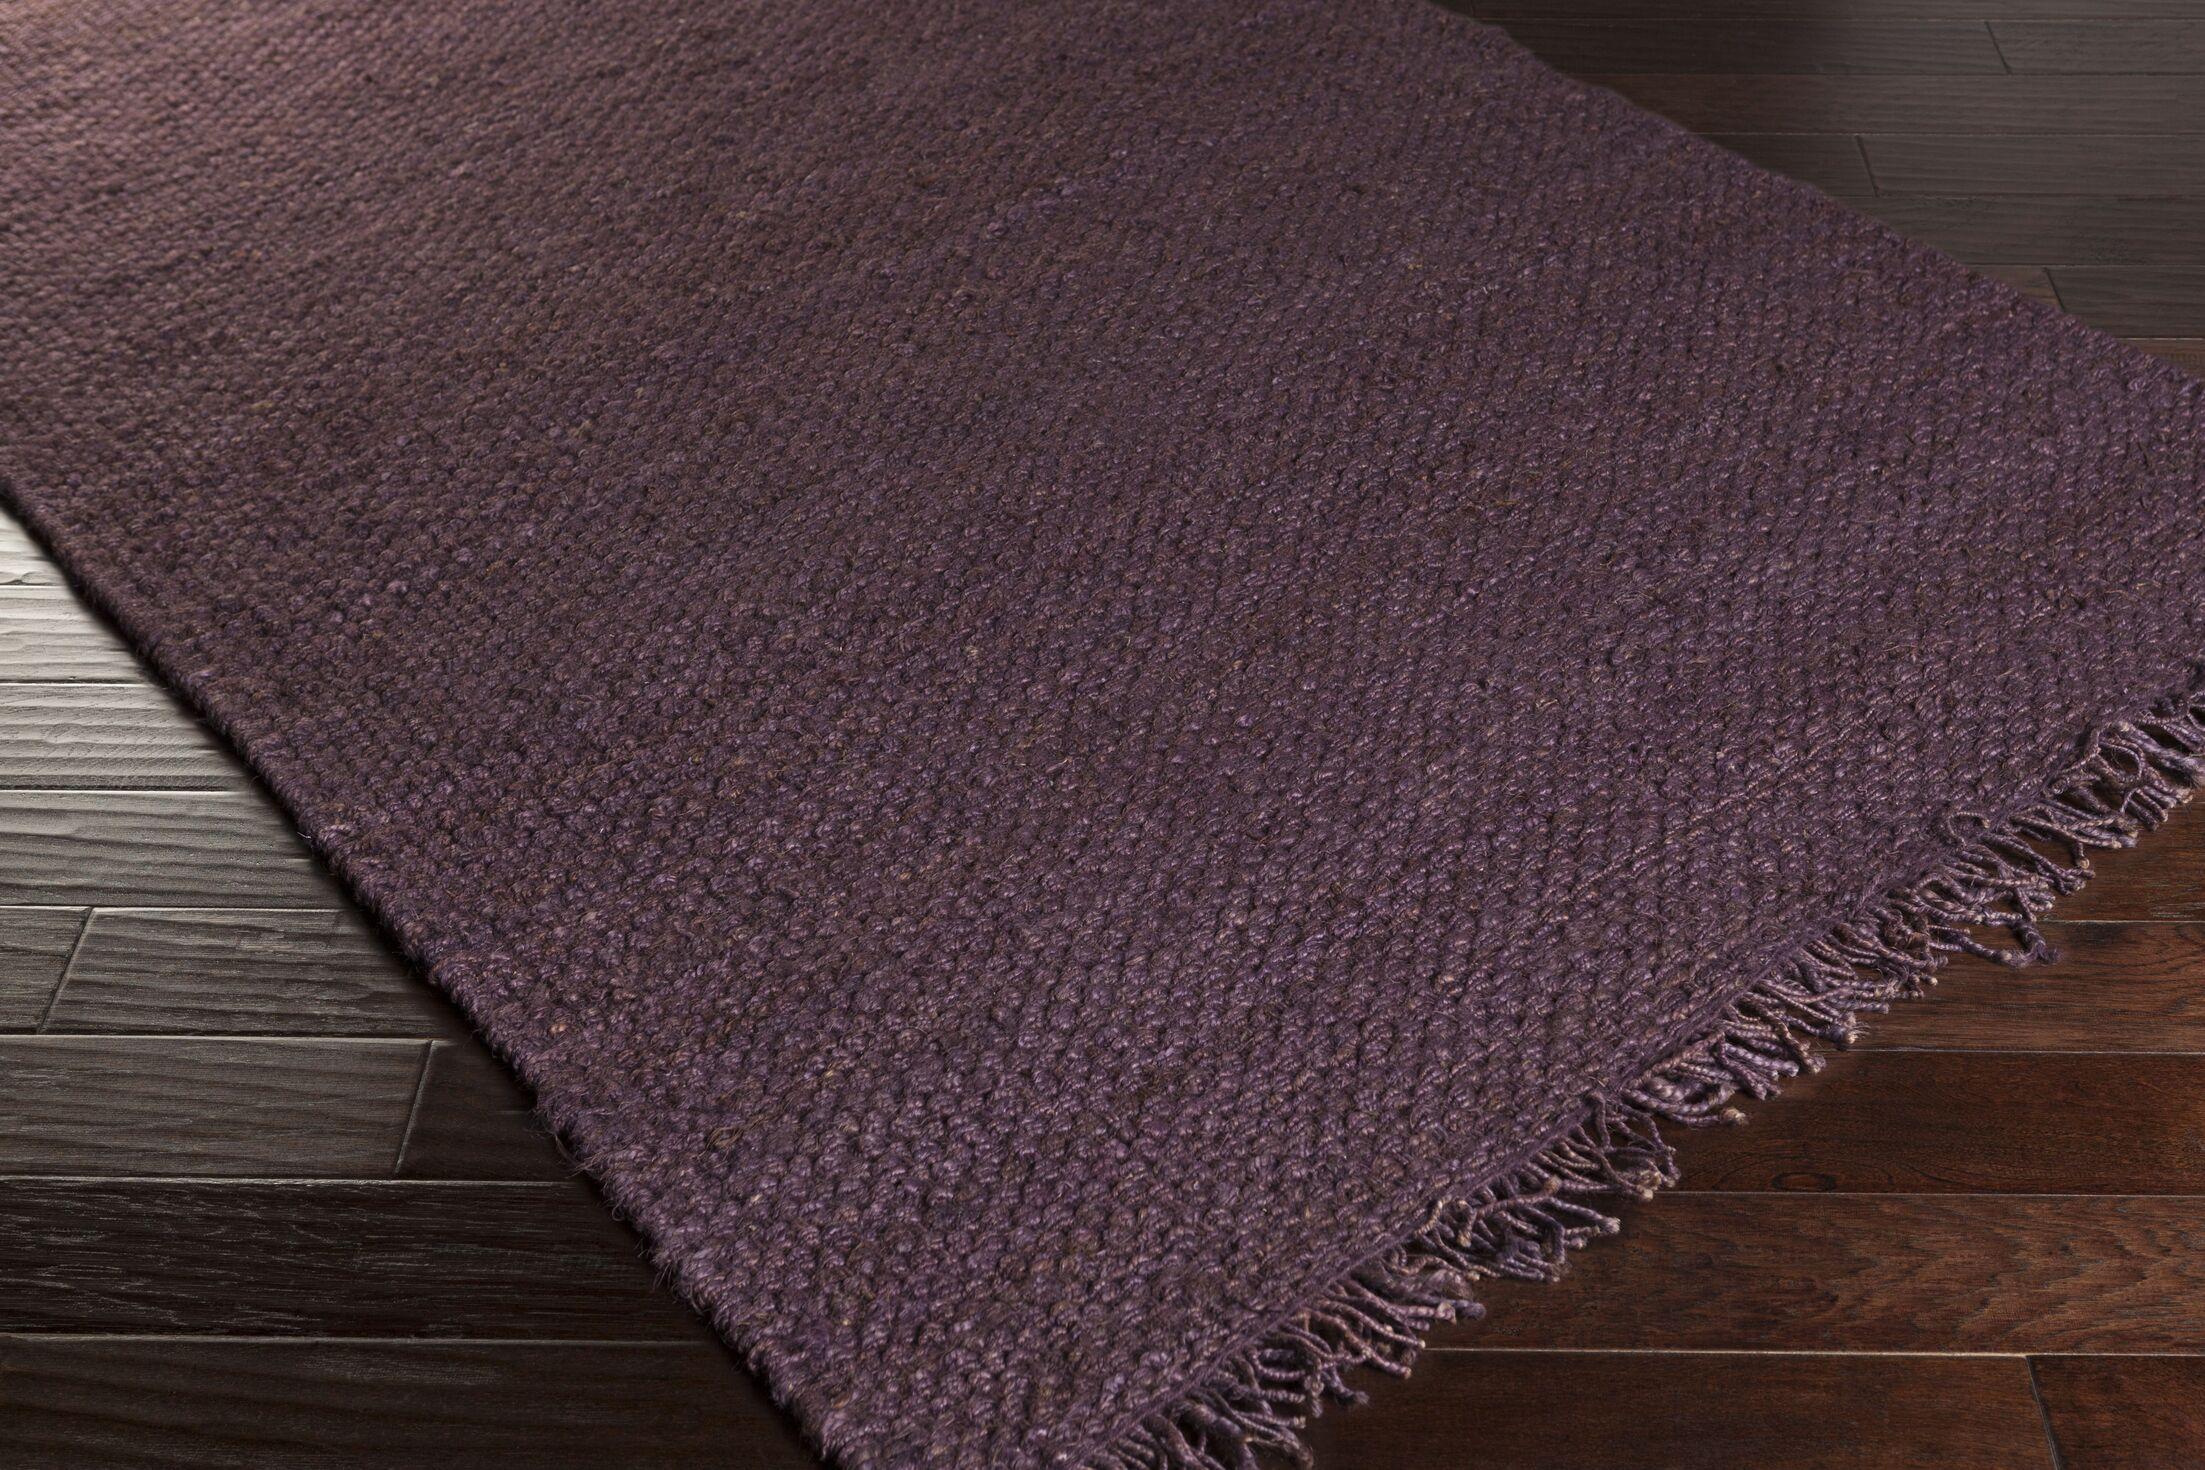 Pineda Hand Woven Purple Area Rug Rug Size: Rectangle 8' x 10'